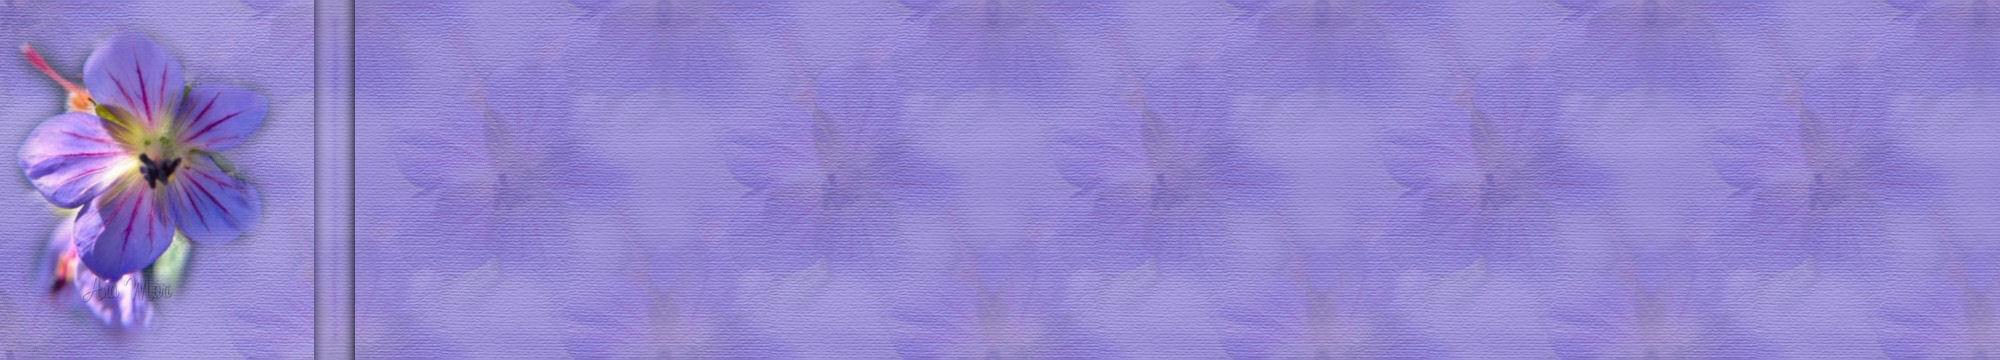 Fondo IM flores_067.imf